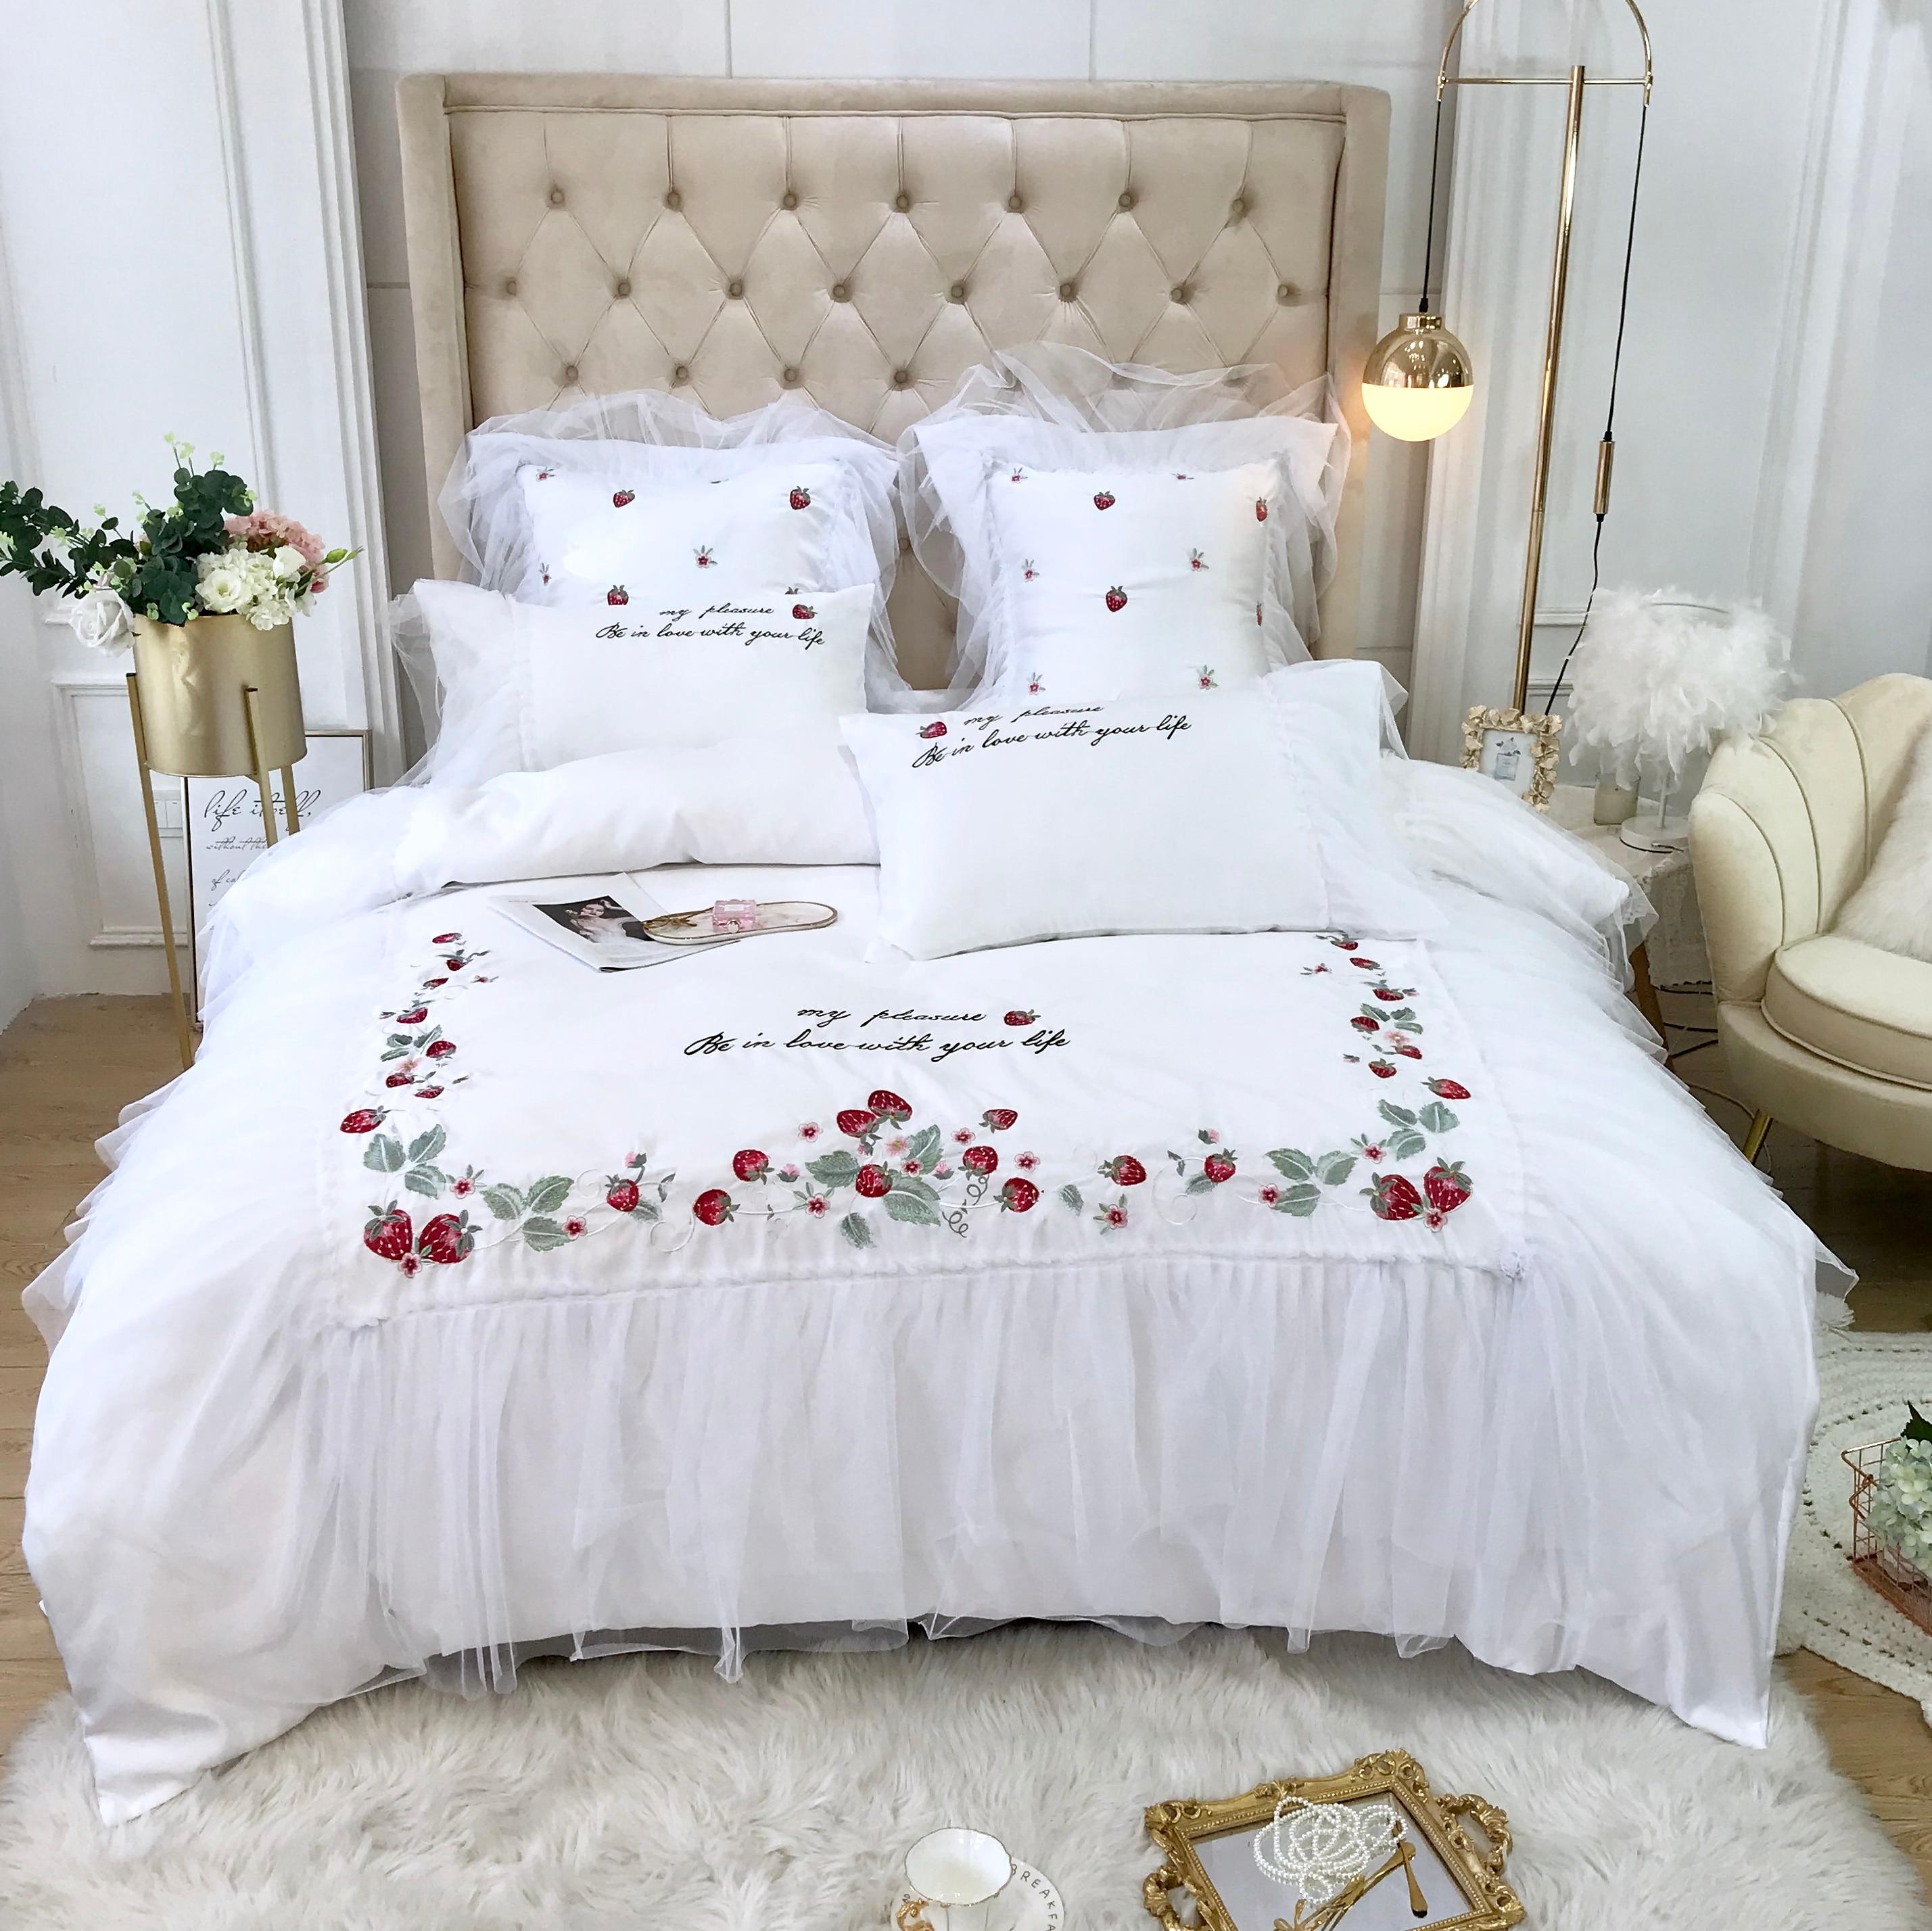 13372 60s Cotton Bedding Set Flower Fairy Strawberry